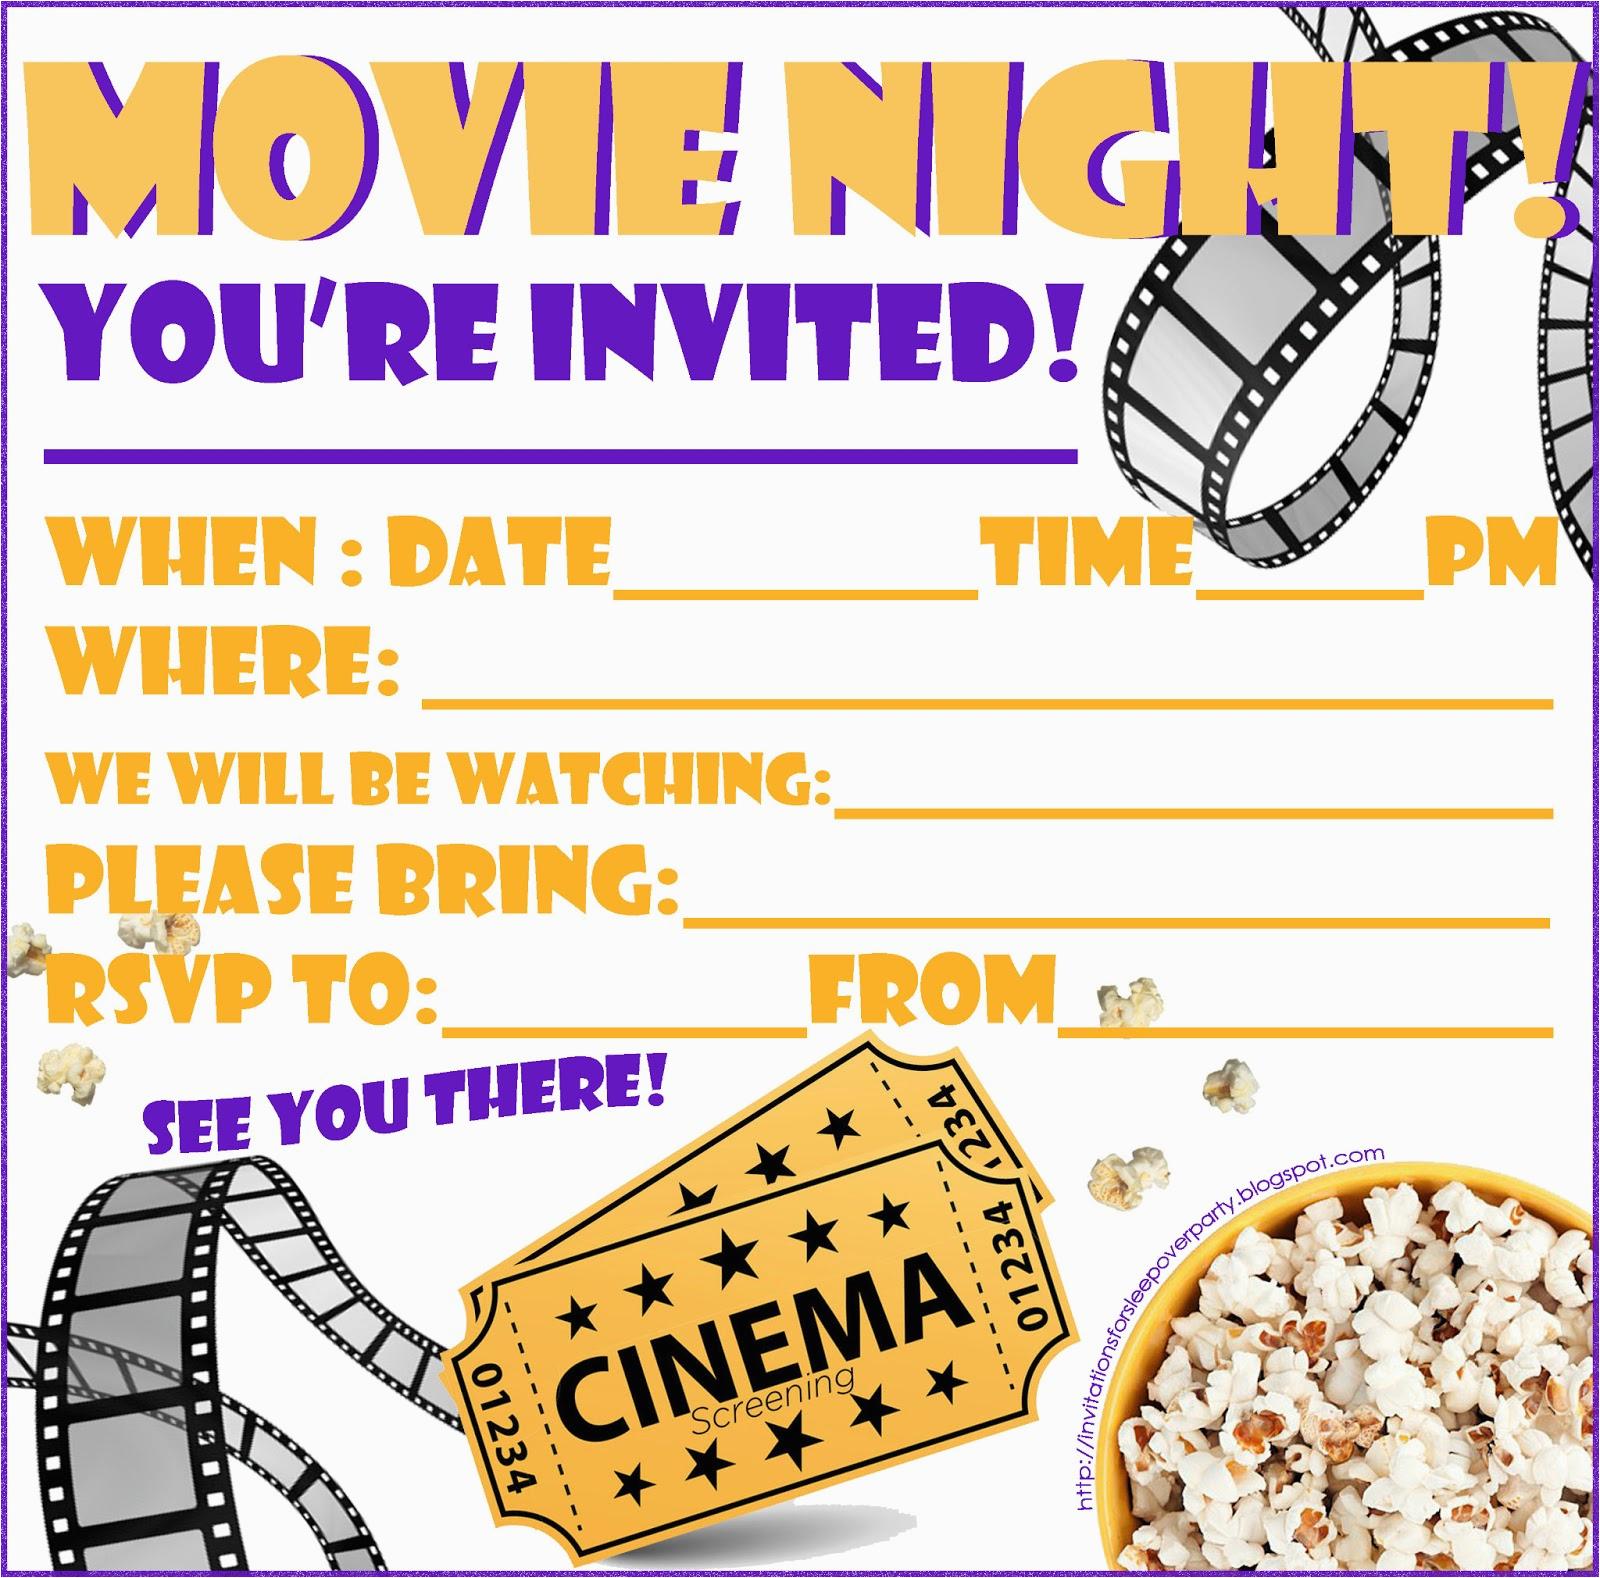 Movie Night Birthday Invitations Free Printable Invitations for Sleepover Party